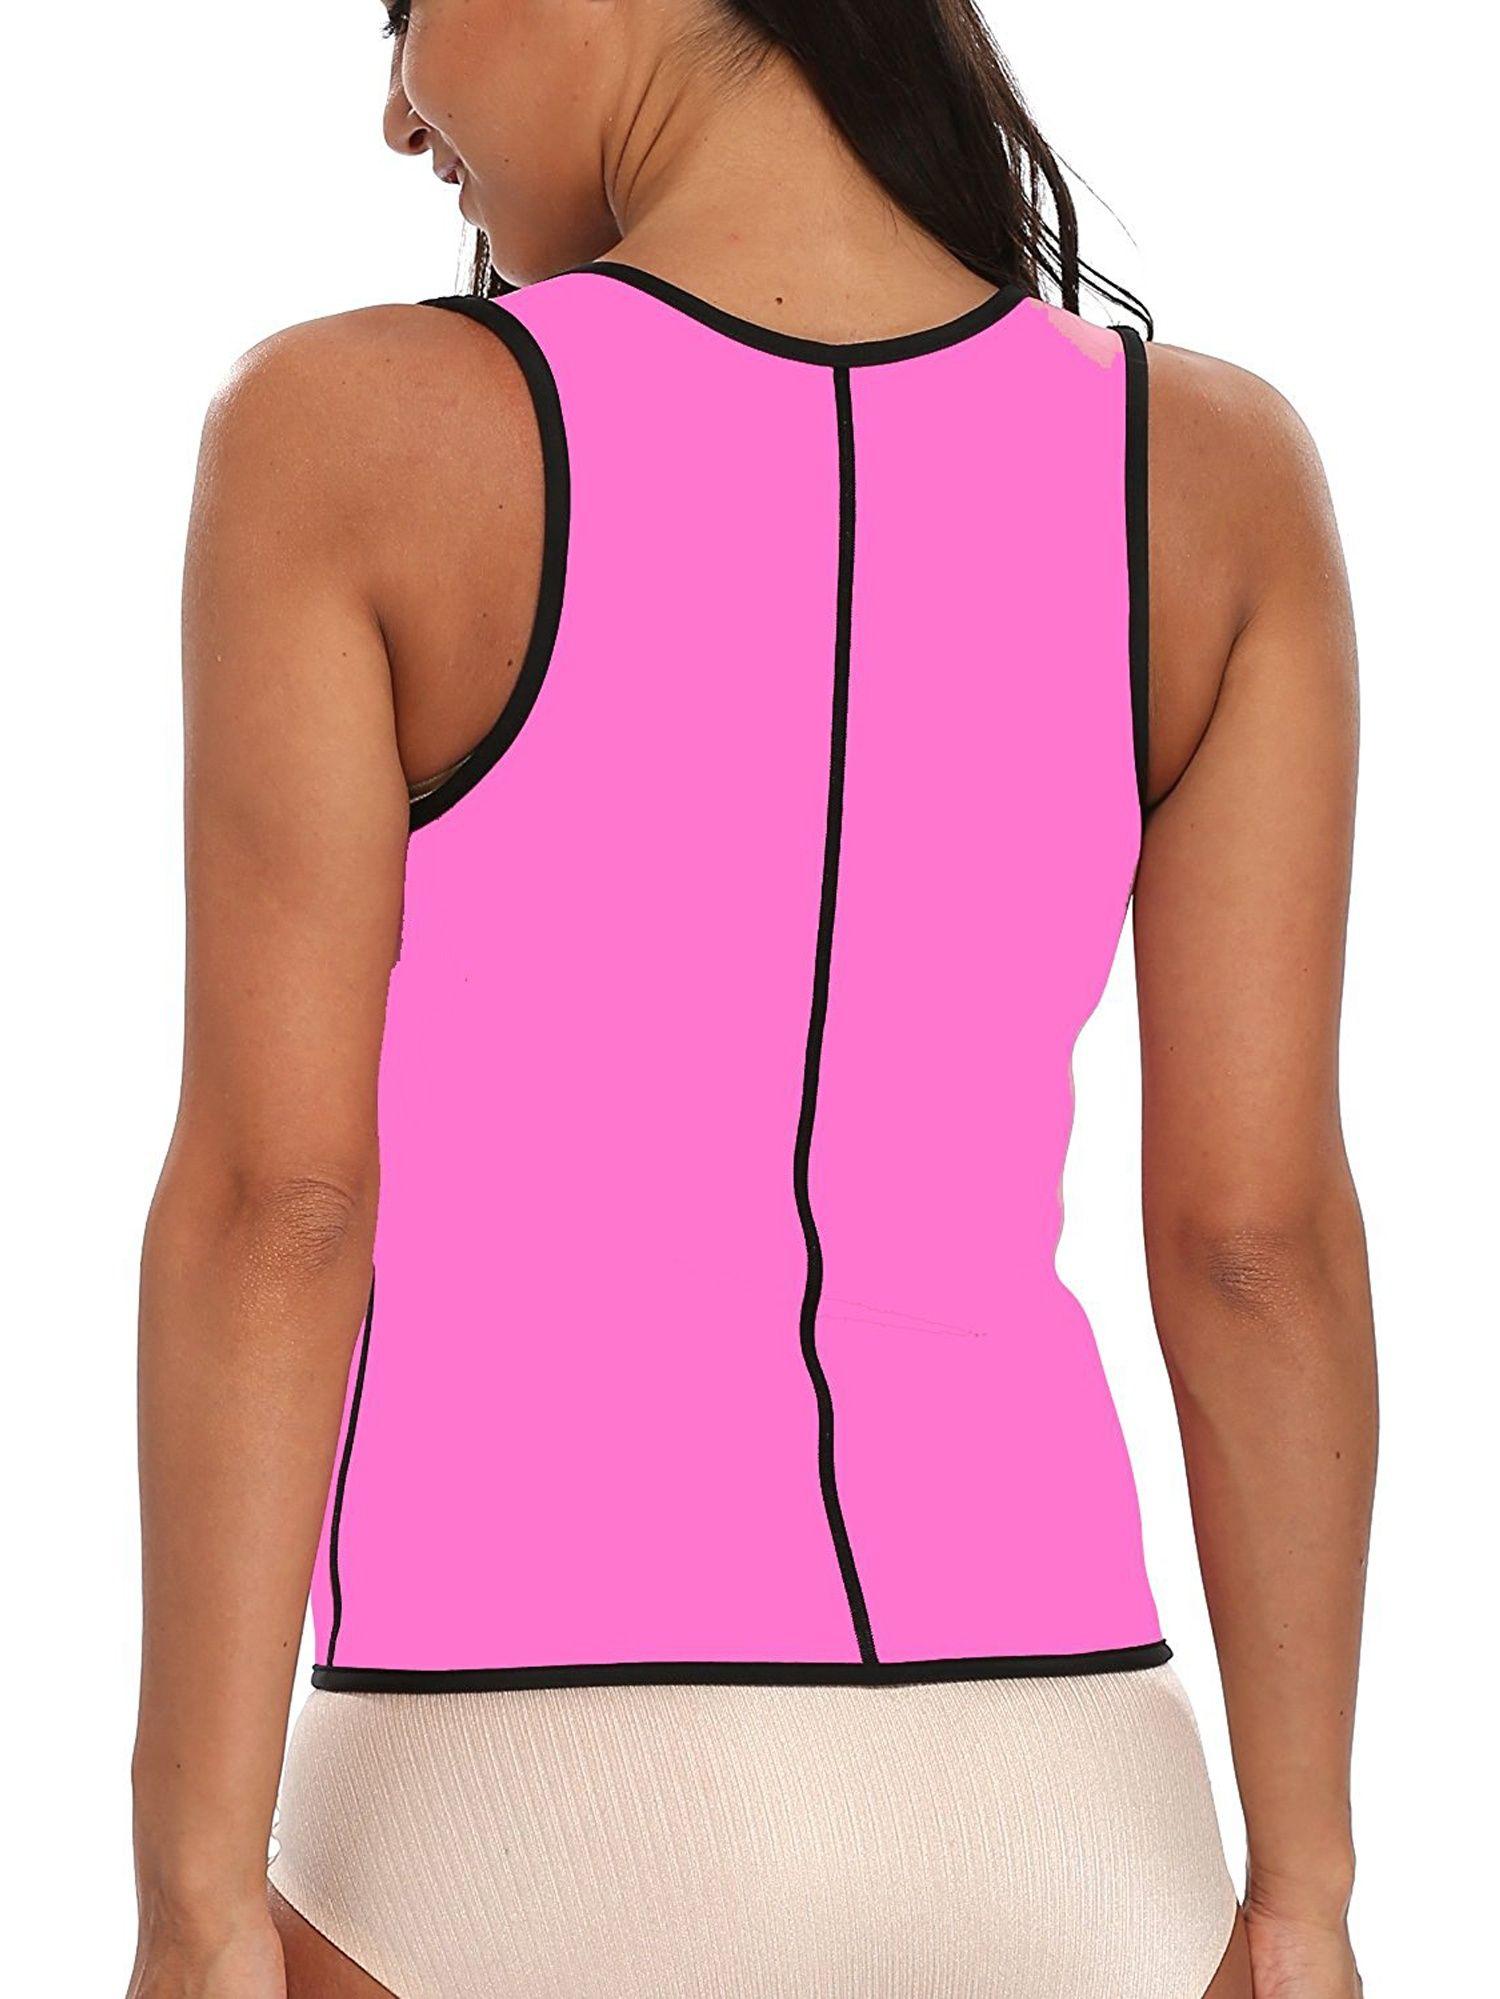 3d087f546a SAYFUT Women s Slimming Vest Hot Sweat Neoprene Shirt Body Shaper Tank Top  Tummy Control Waist Trainer